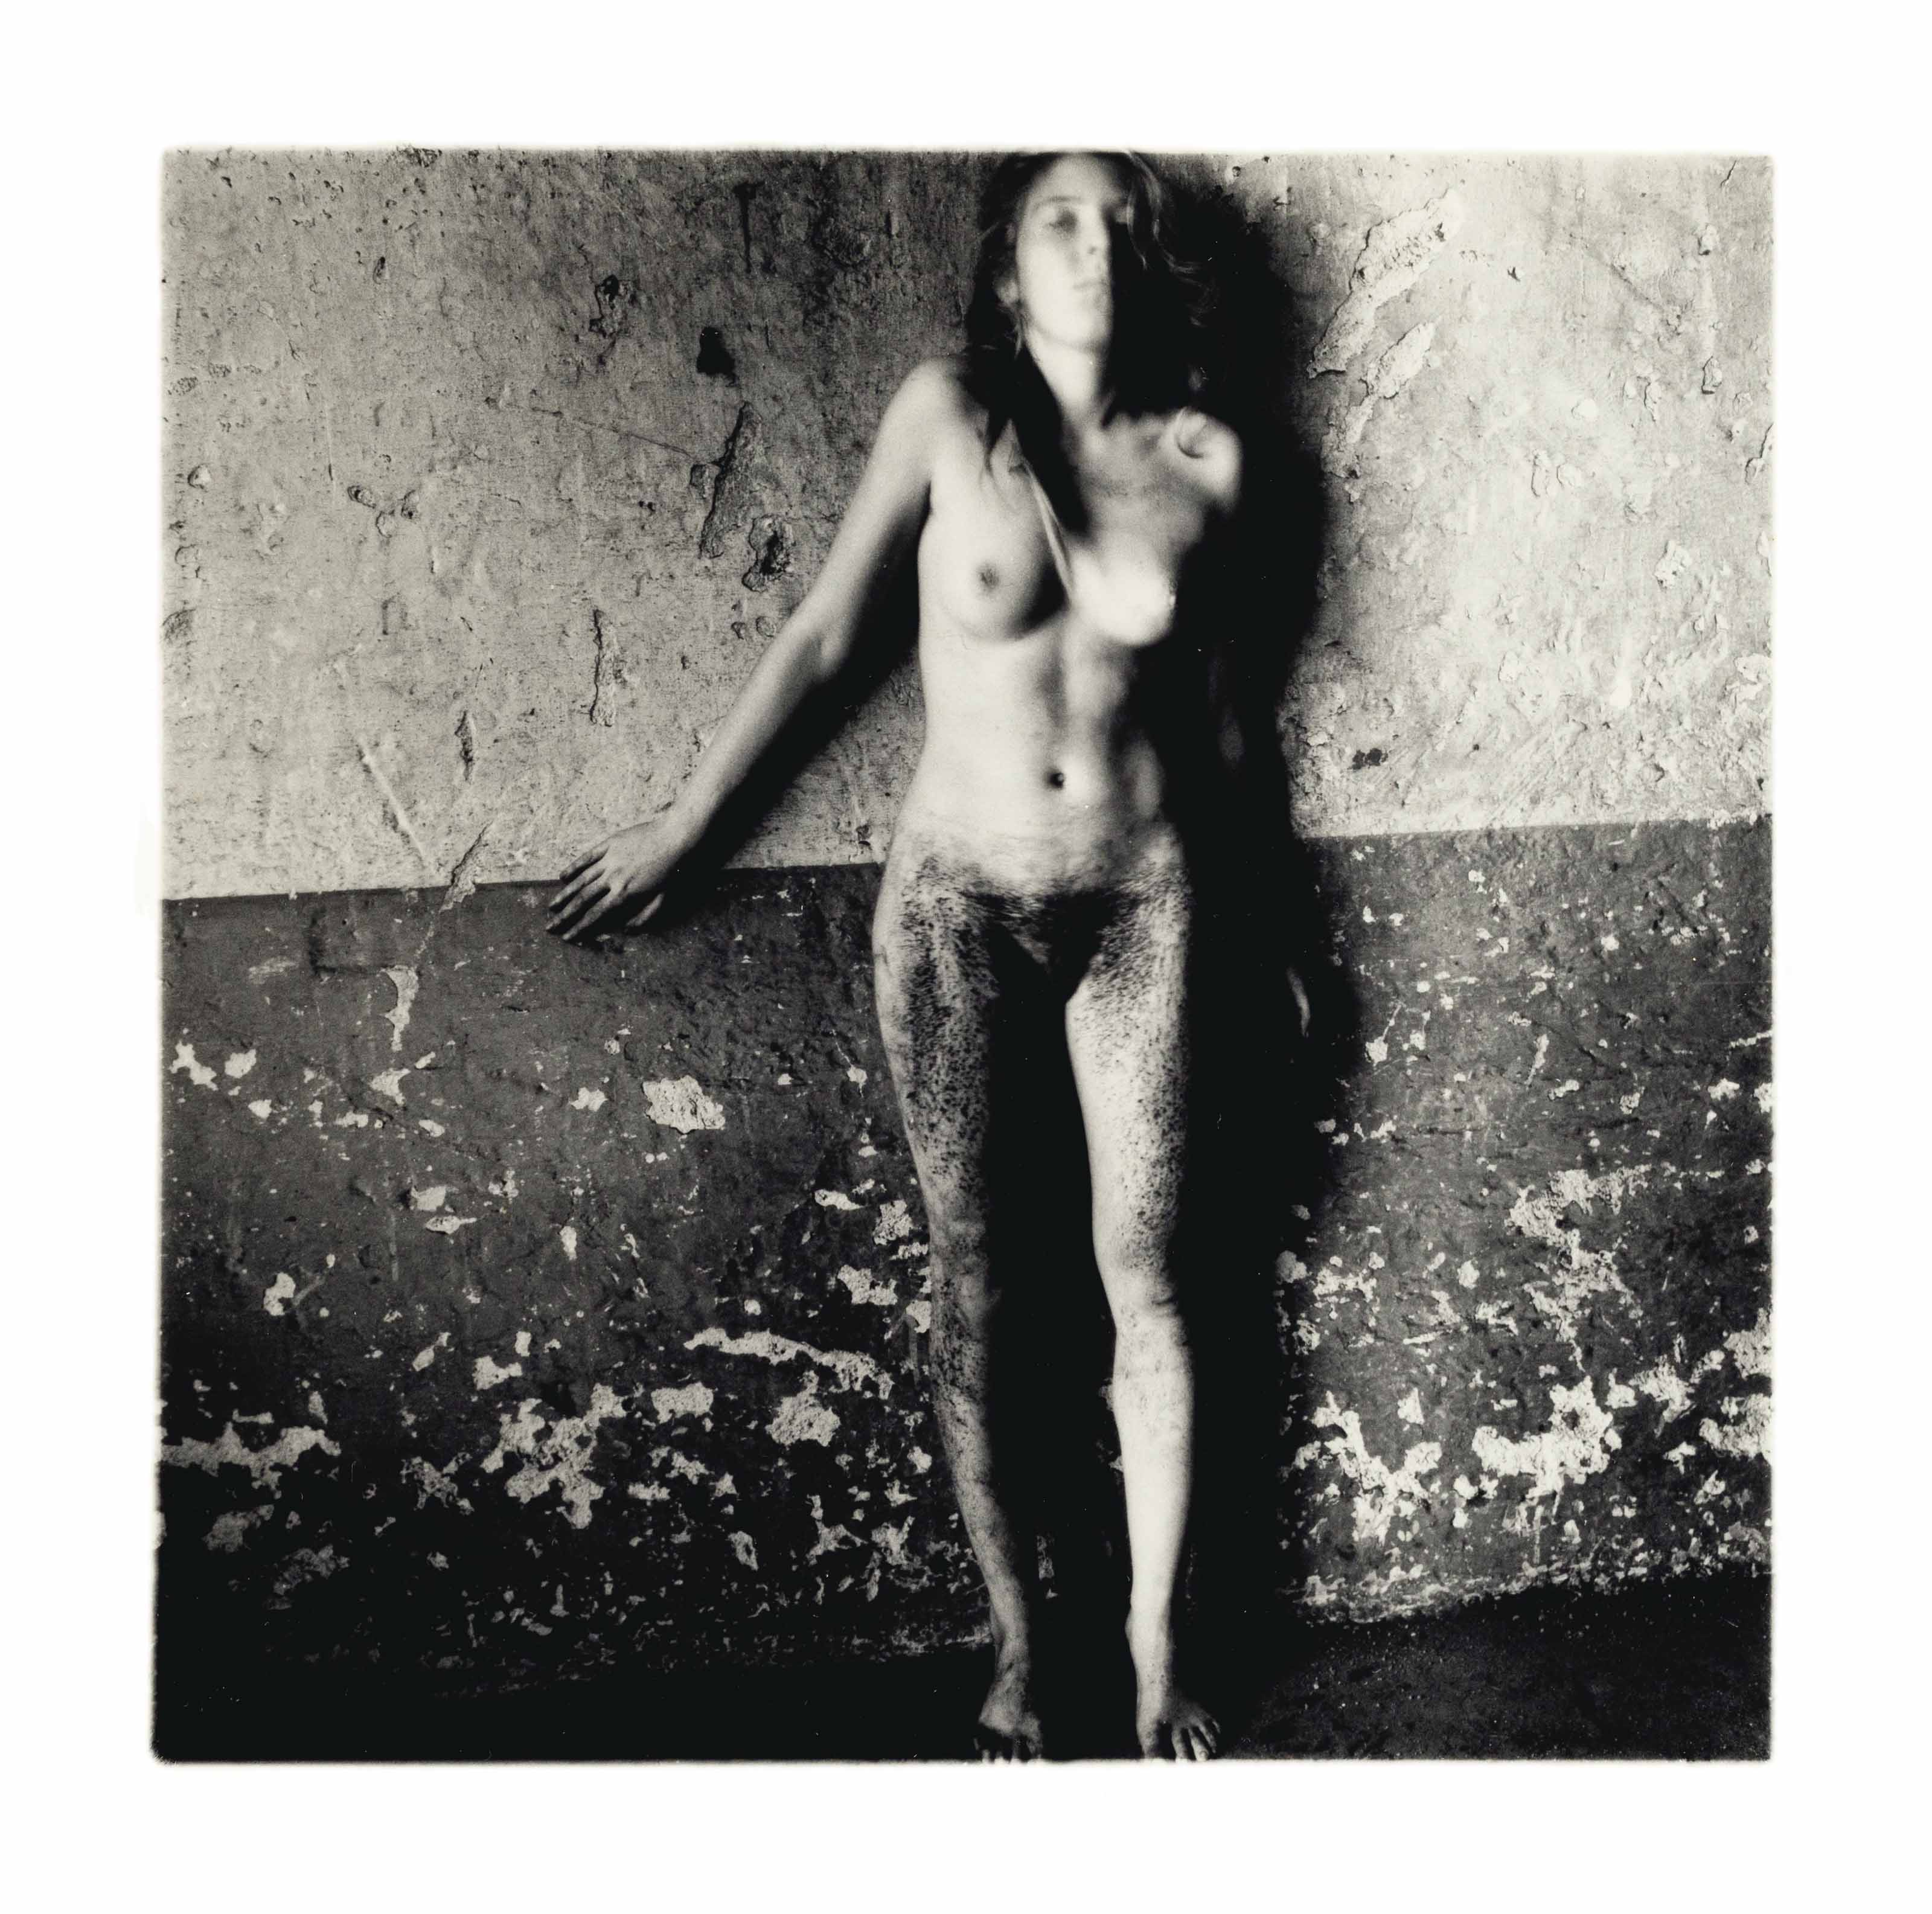 Untitled, Rome, c. 1977-1978